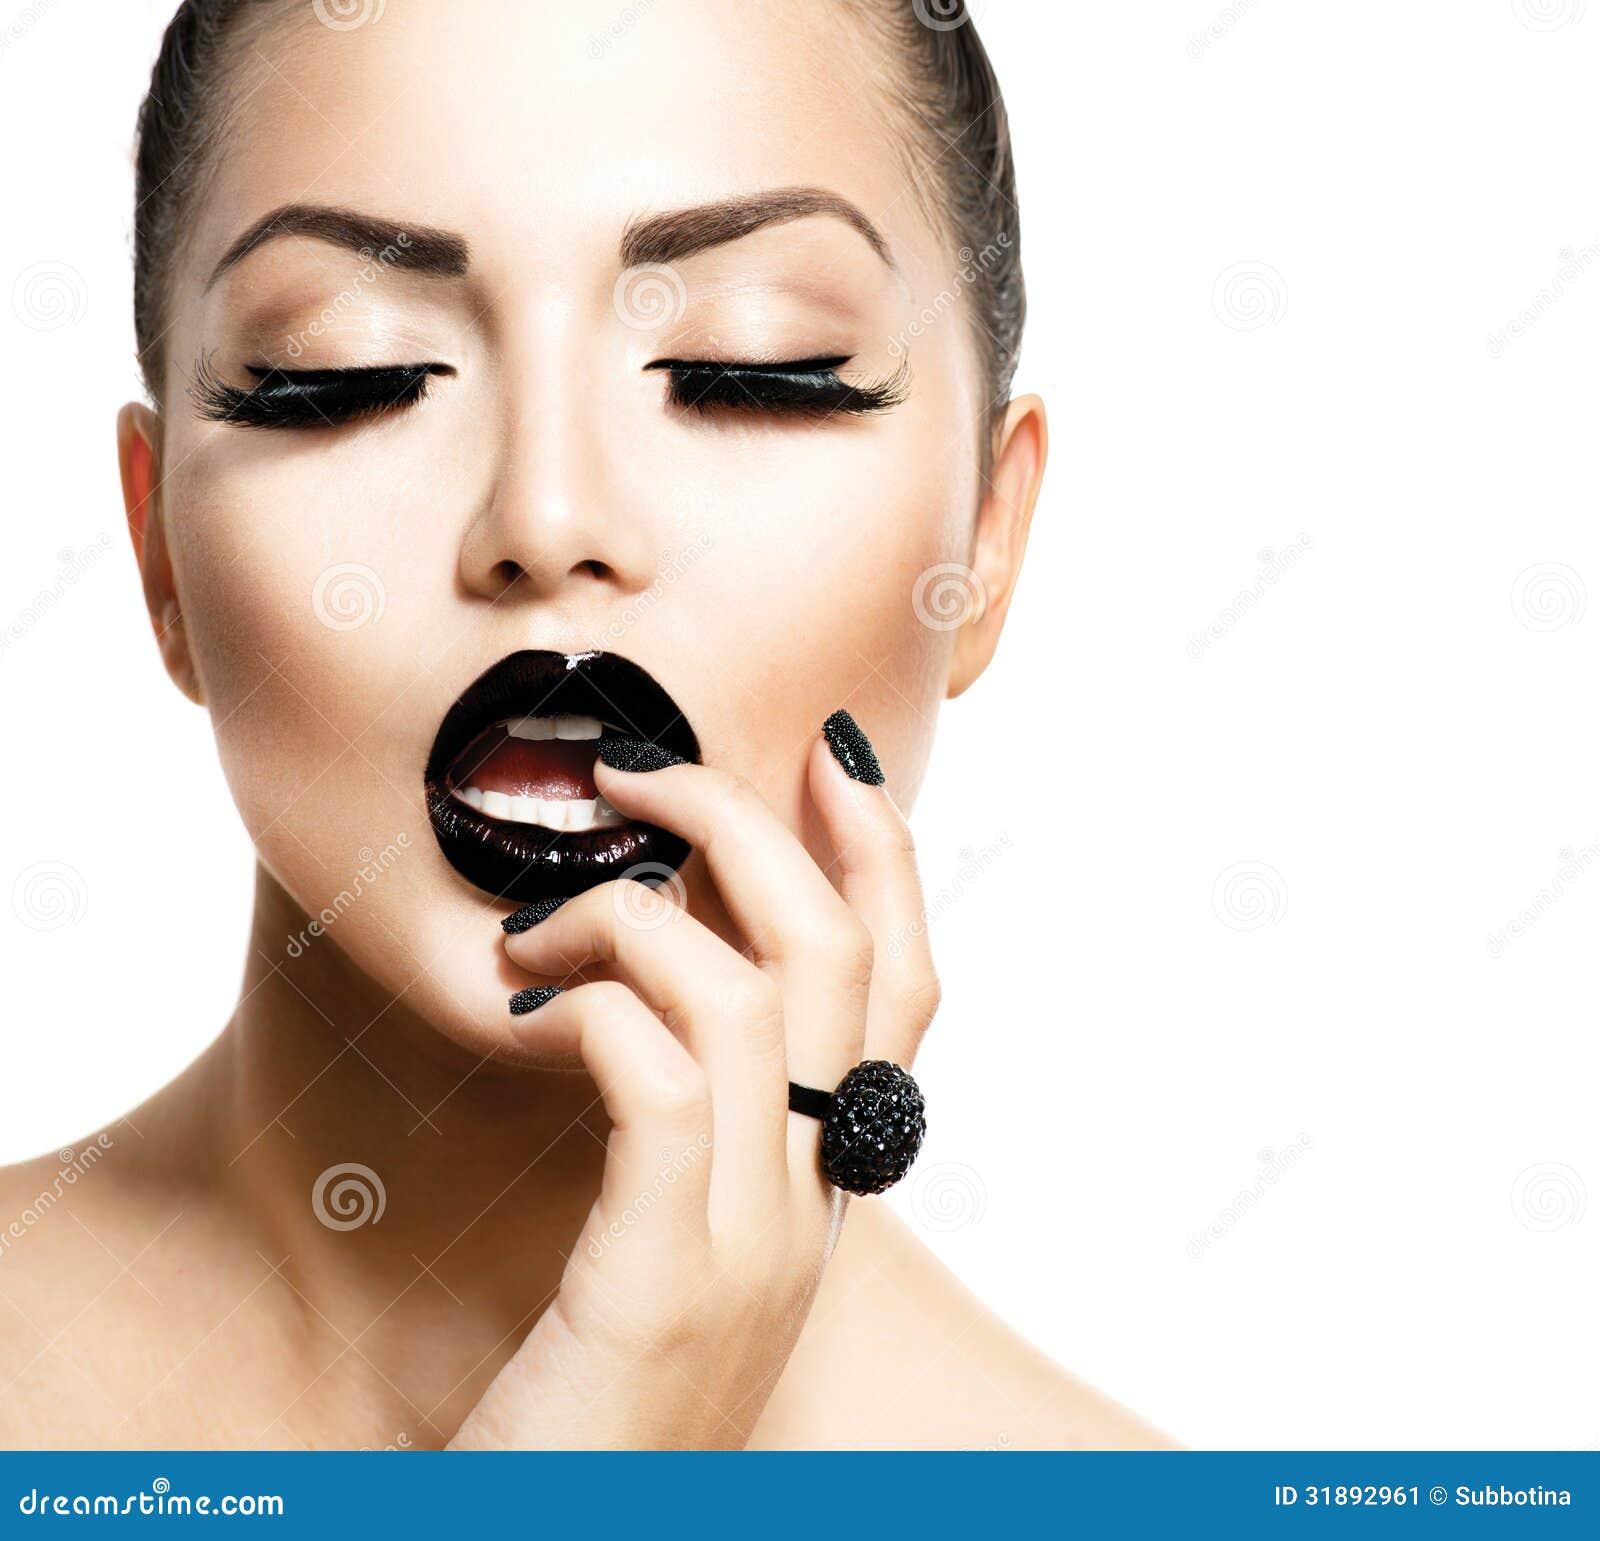 Fashion Beauty Model Girl Stock Image Image Of Manicured: Vogue Style Fashion Girl Stock Image. Image Of Make, Long